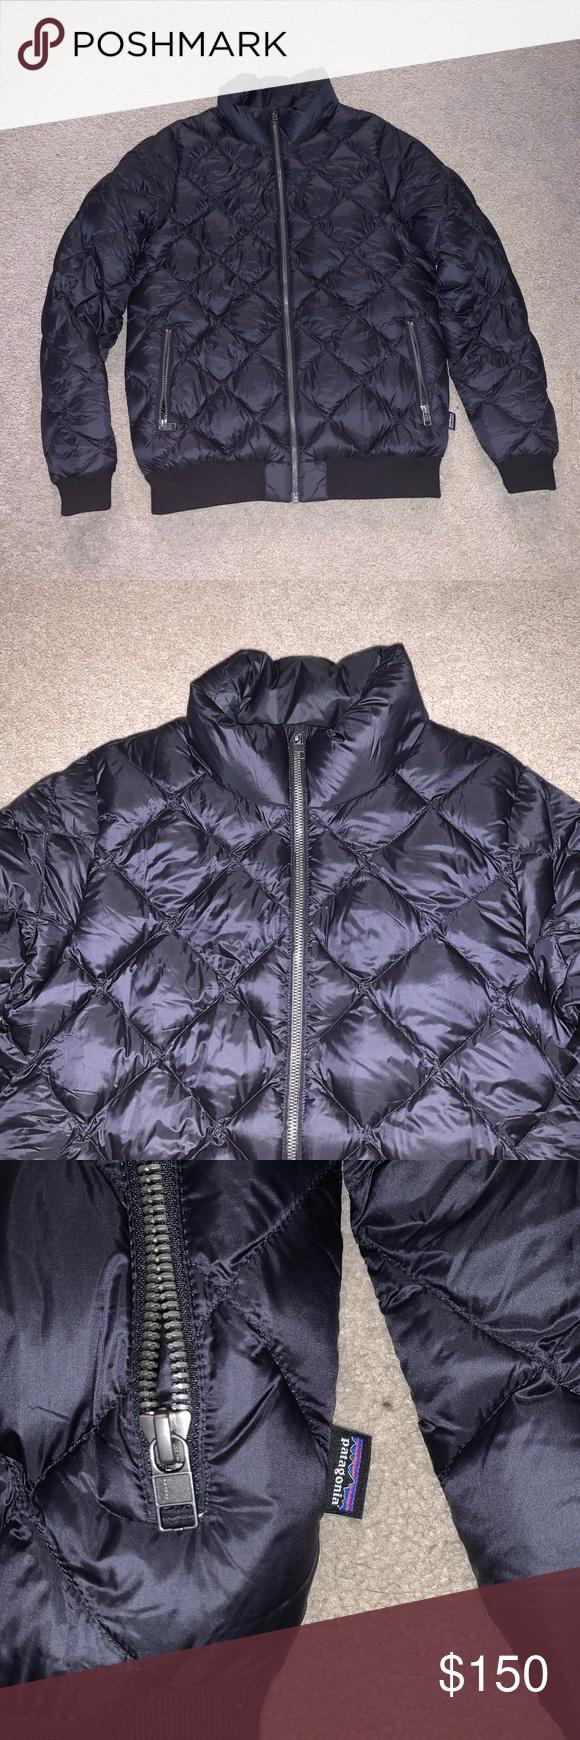 Patagonia Women Quilted Black M Puffer Jacket Patagonia Womens Puffer Jacket Women Jackets [ 1740 x 580 Pixel ]